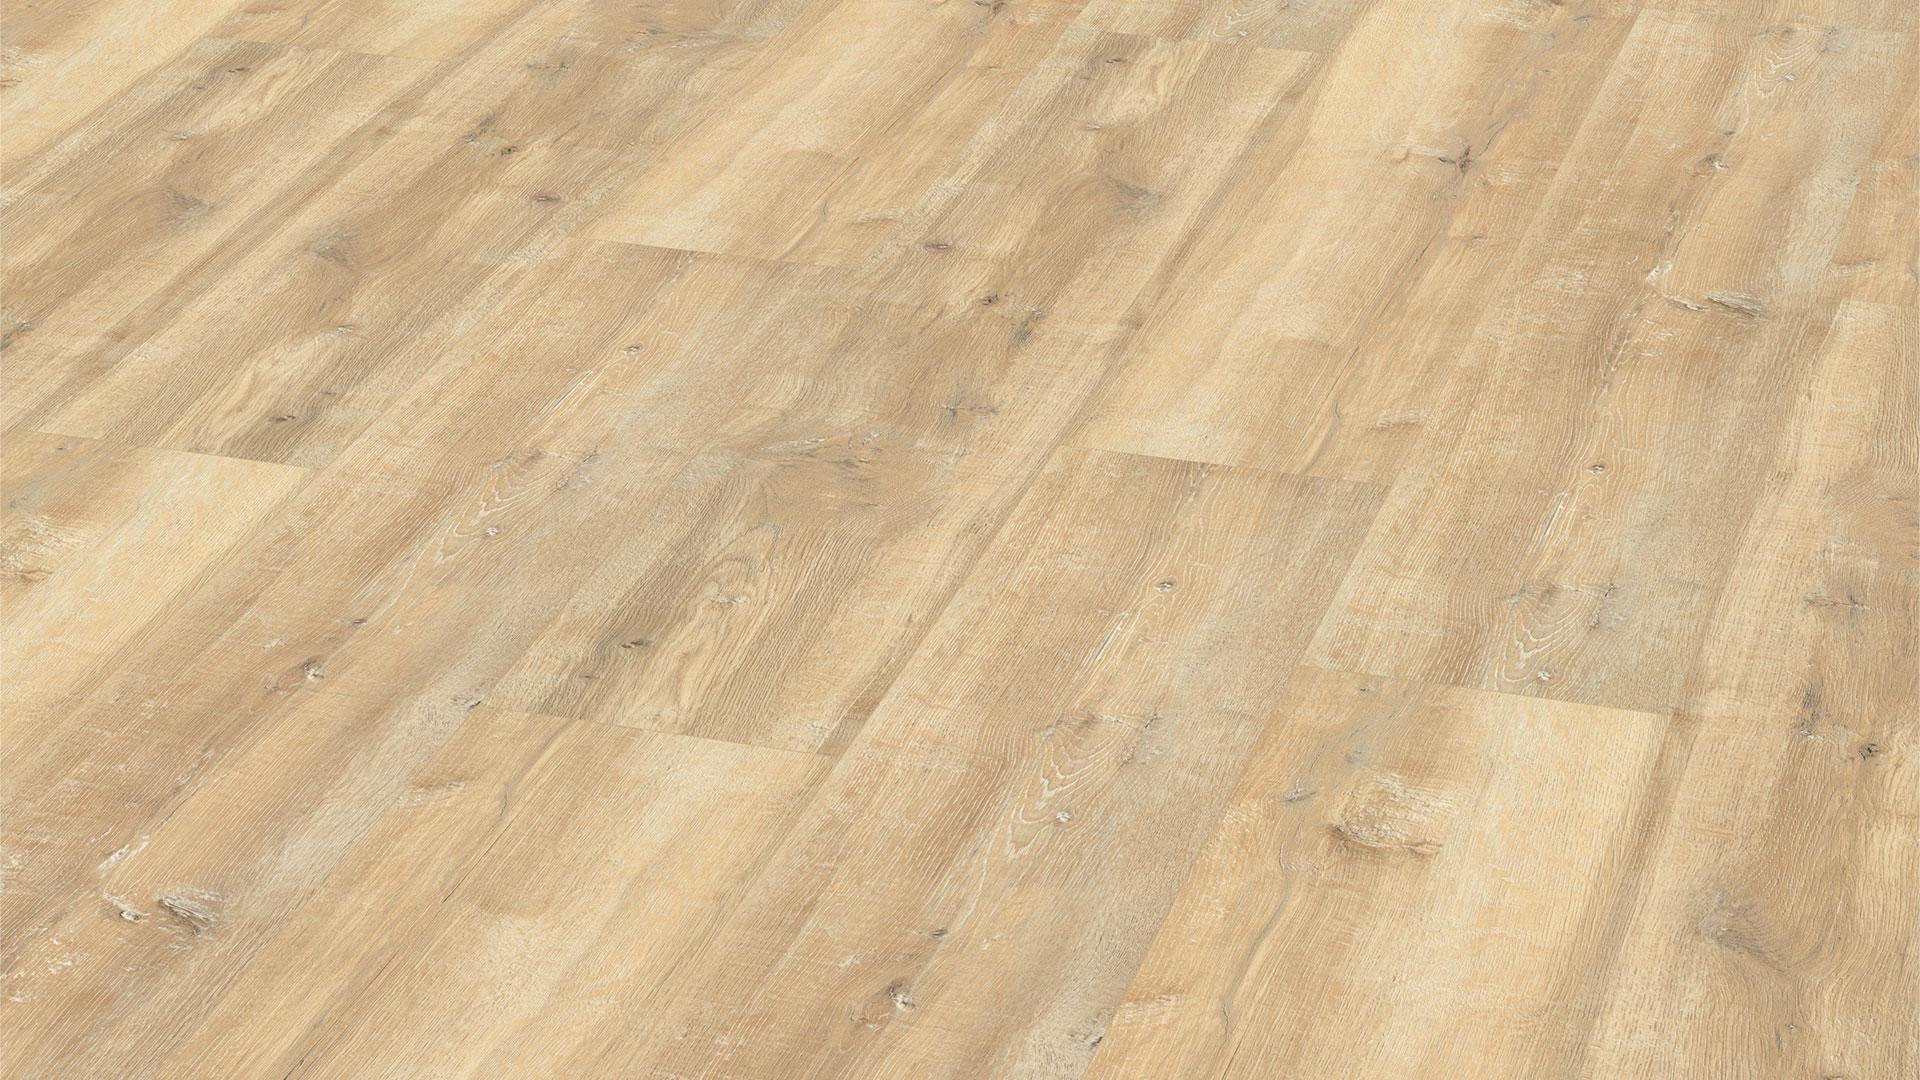 Fußbodenbelag Xl ~ Wood xl pl092c fashion oak cre designböden sonnhaus purline